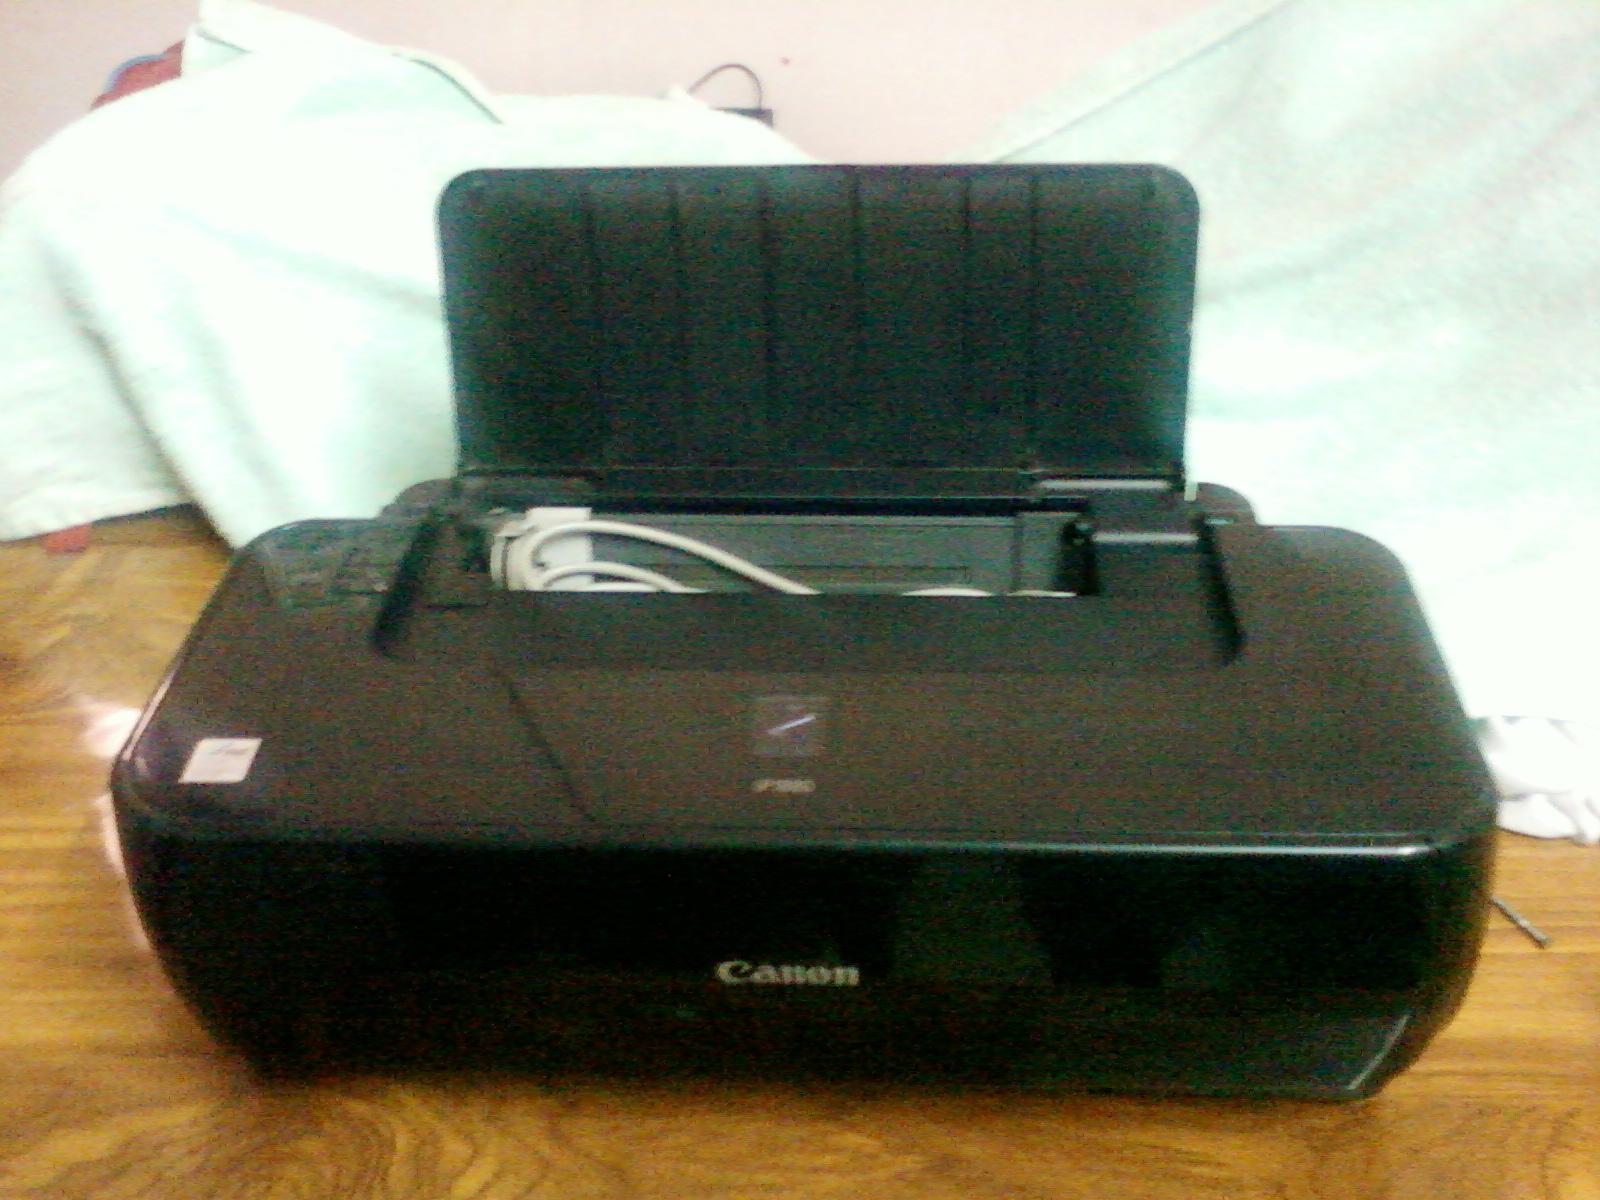 cannon ip 1800 printer